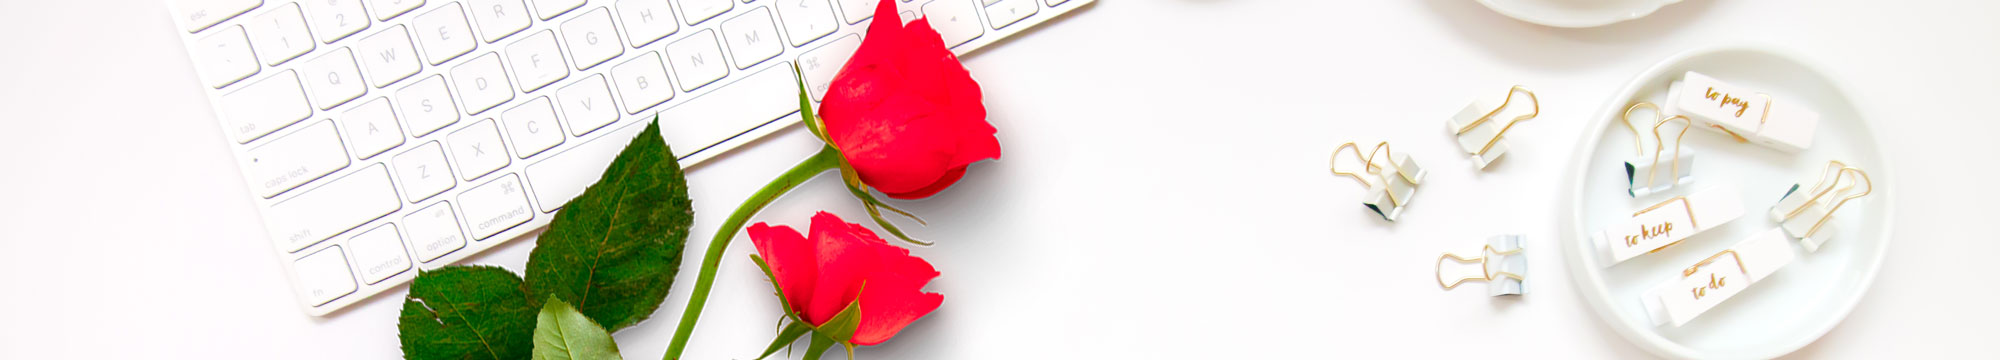 Website-Banner-with-desktop-and-roses.jpg